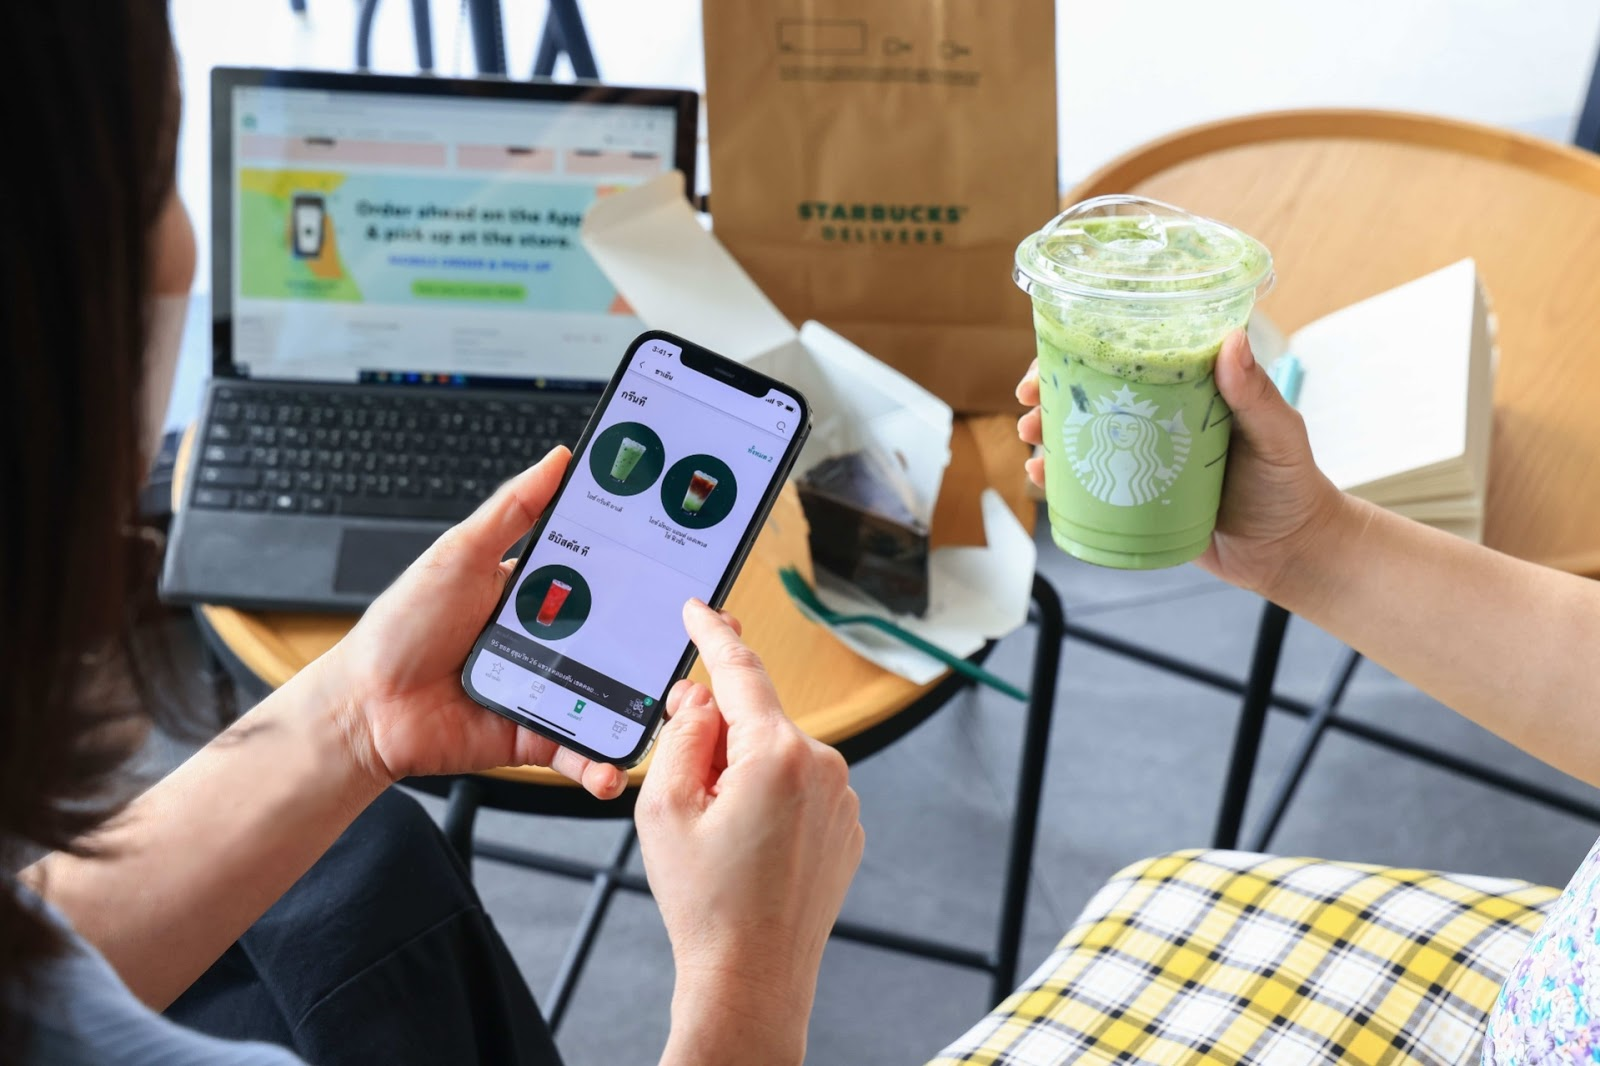 Starbucks เปิดตัวบริการเดลิเวอรี่บนแอปพลิเคชัน Starbucks Thailand